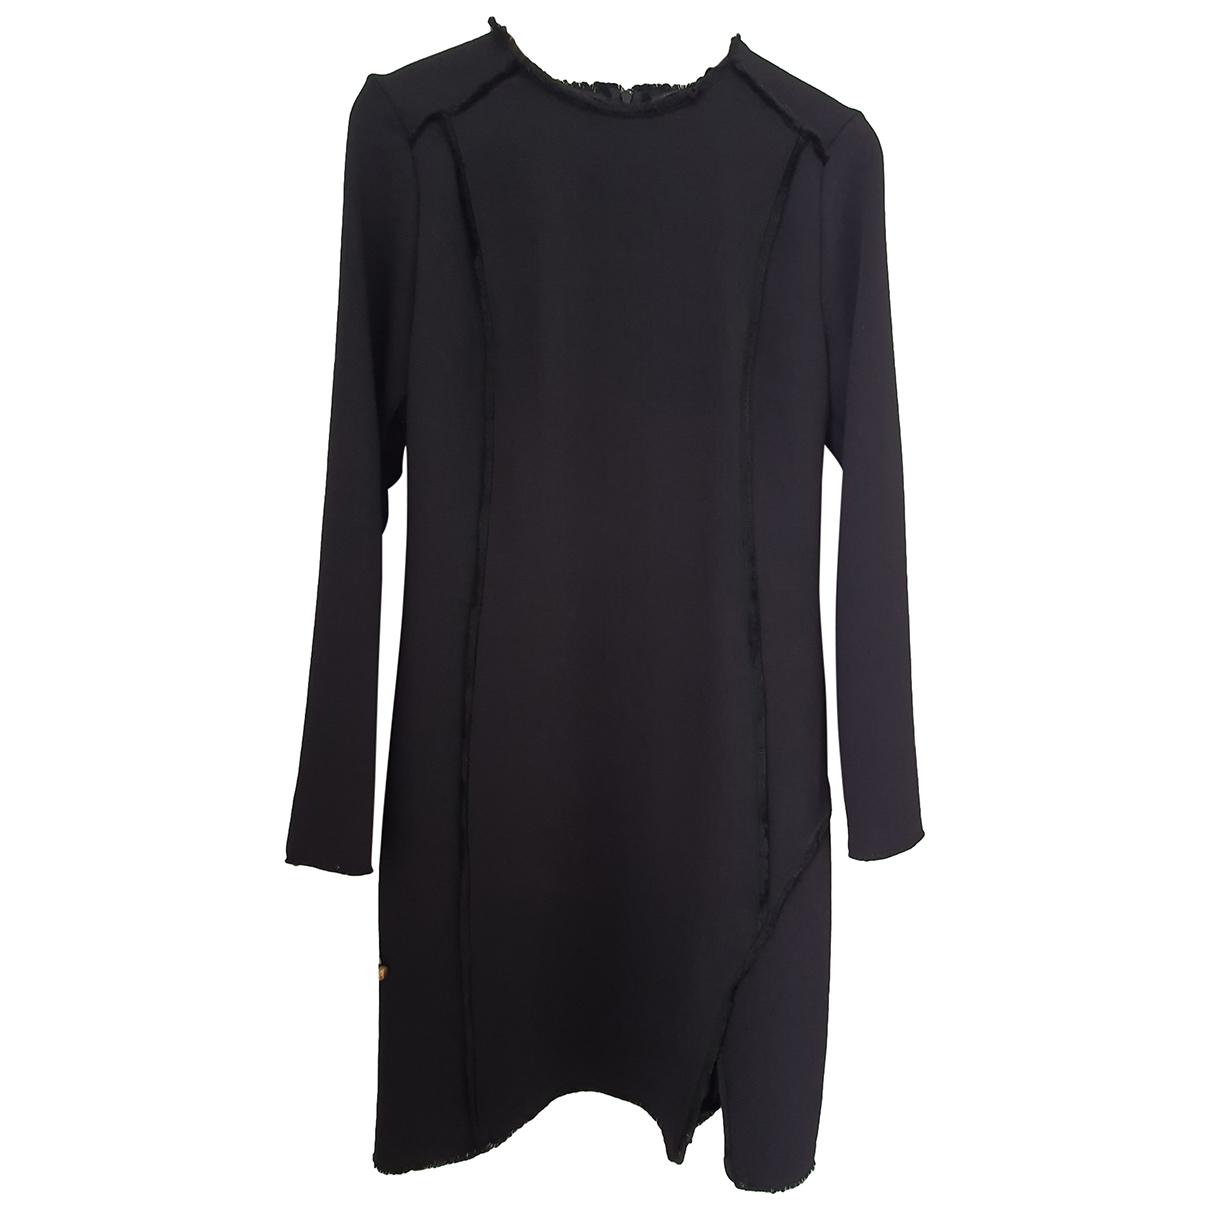 Ikks \N Kleid in  Schwarz Polyester